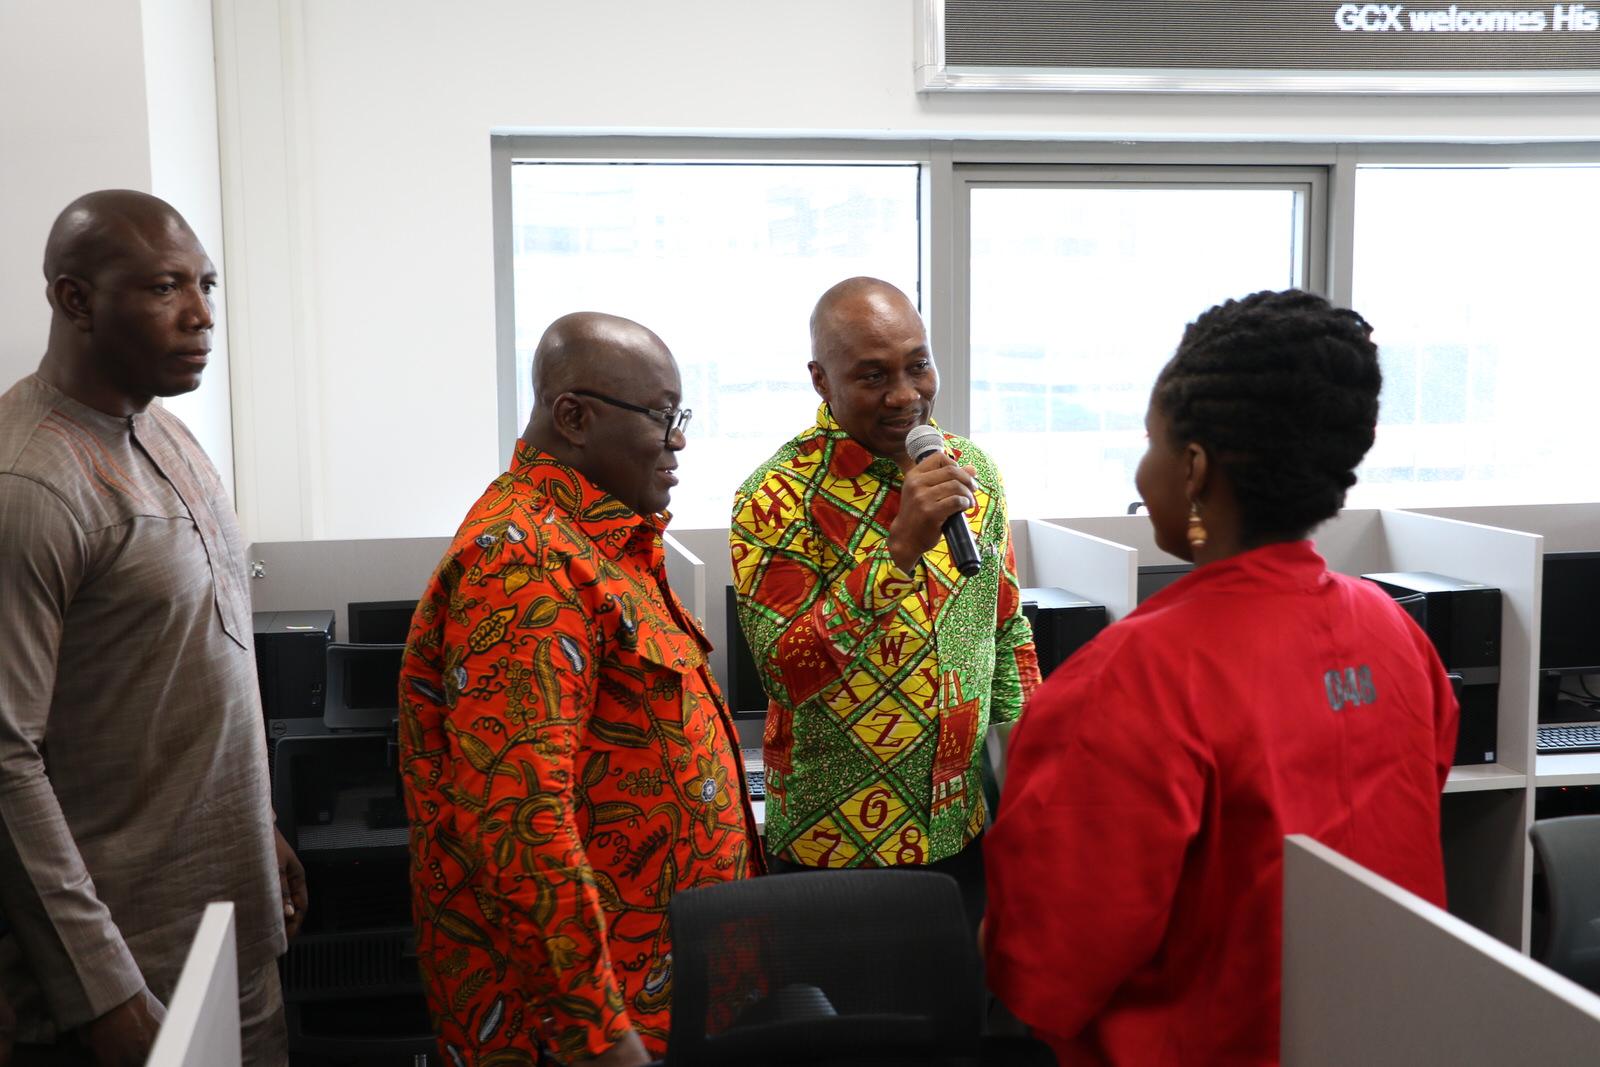 H.E Nana Akuffo Addo being introduced to trader by the Gcx CEO Alfah Khadri.JPG